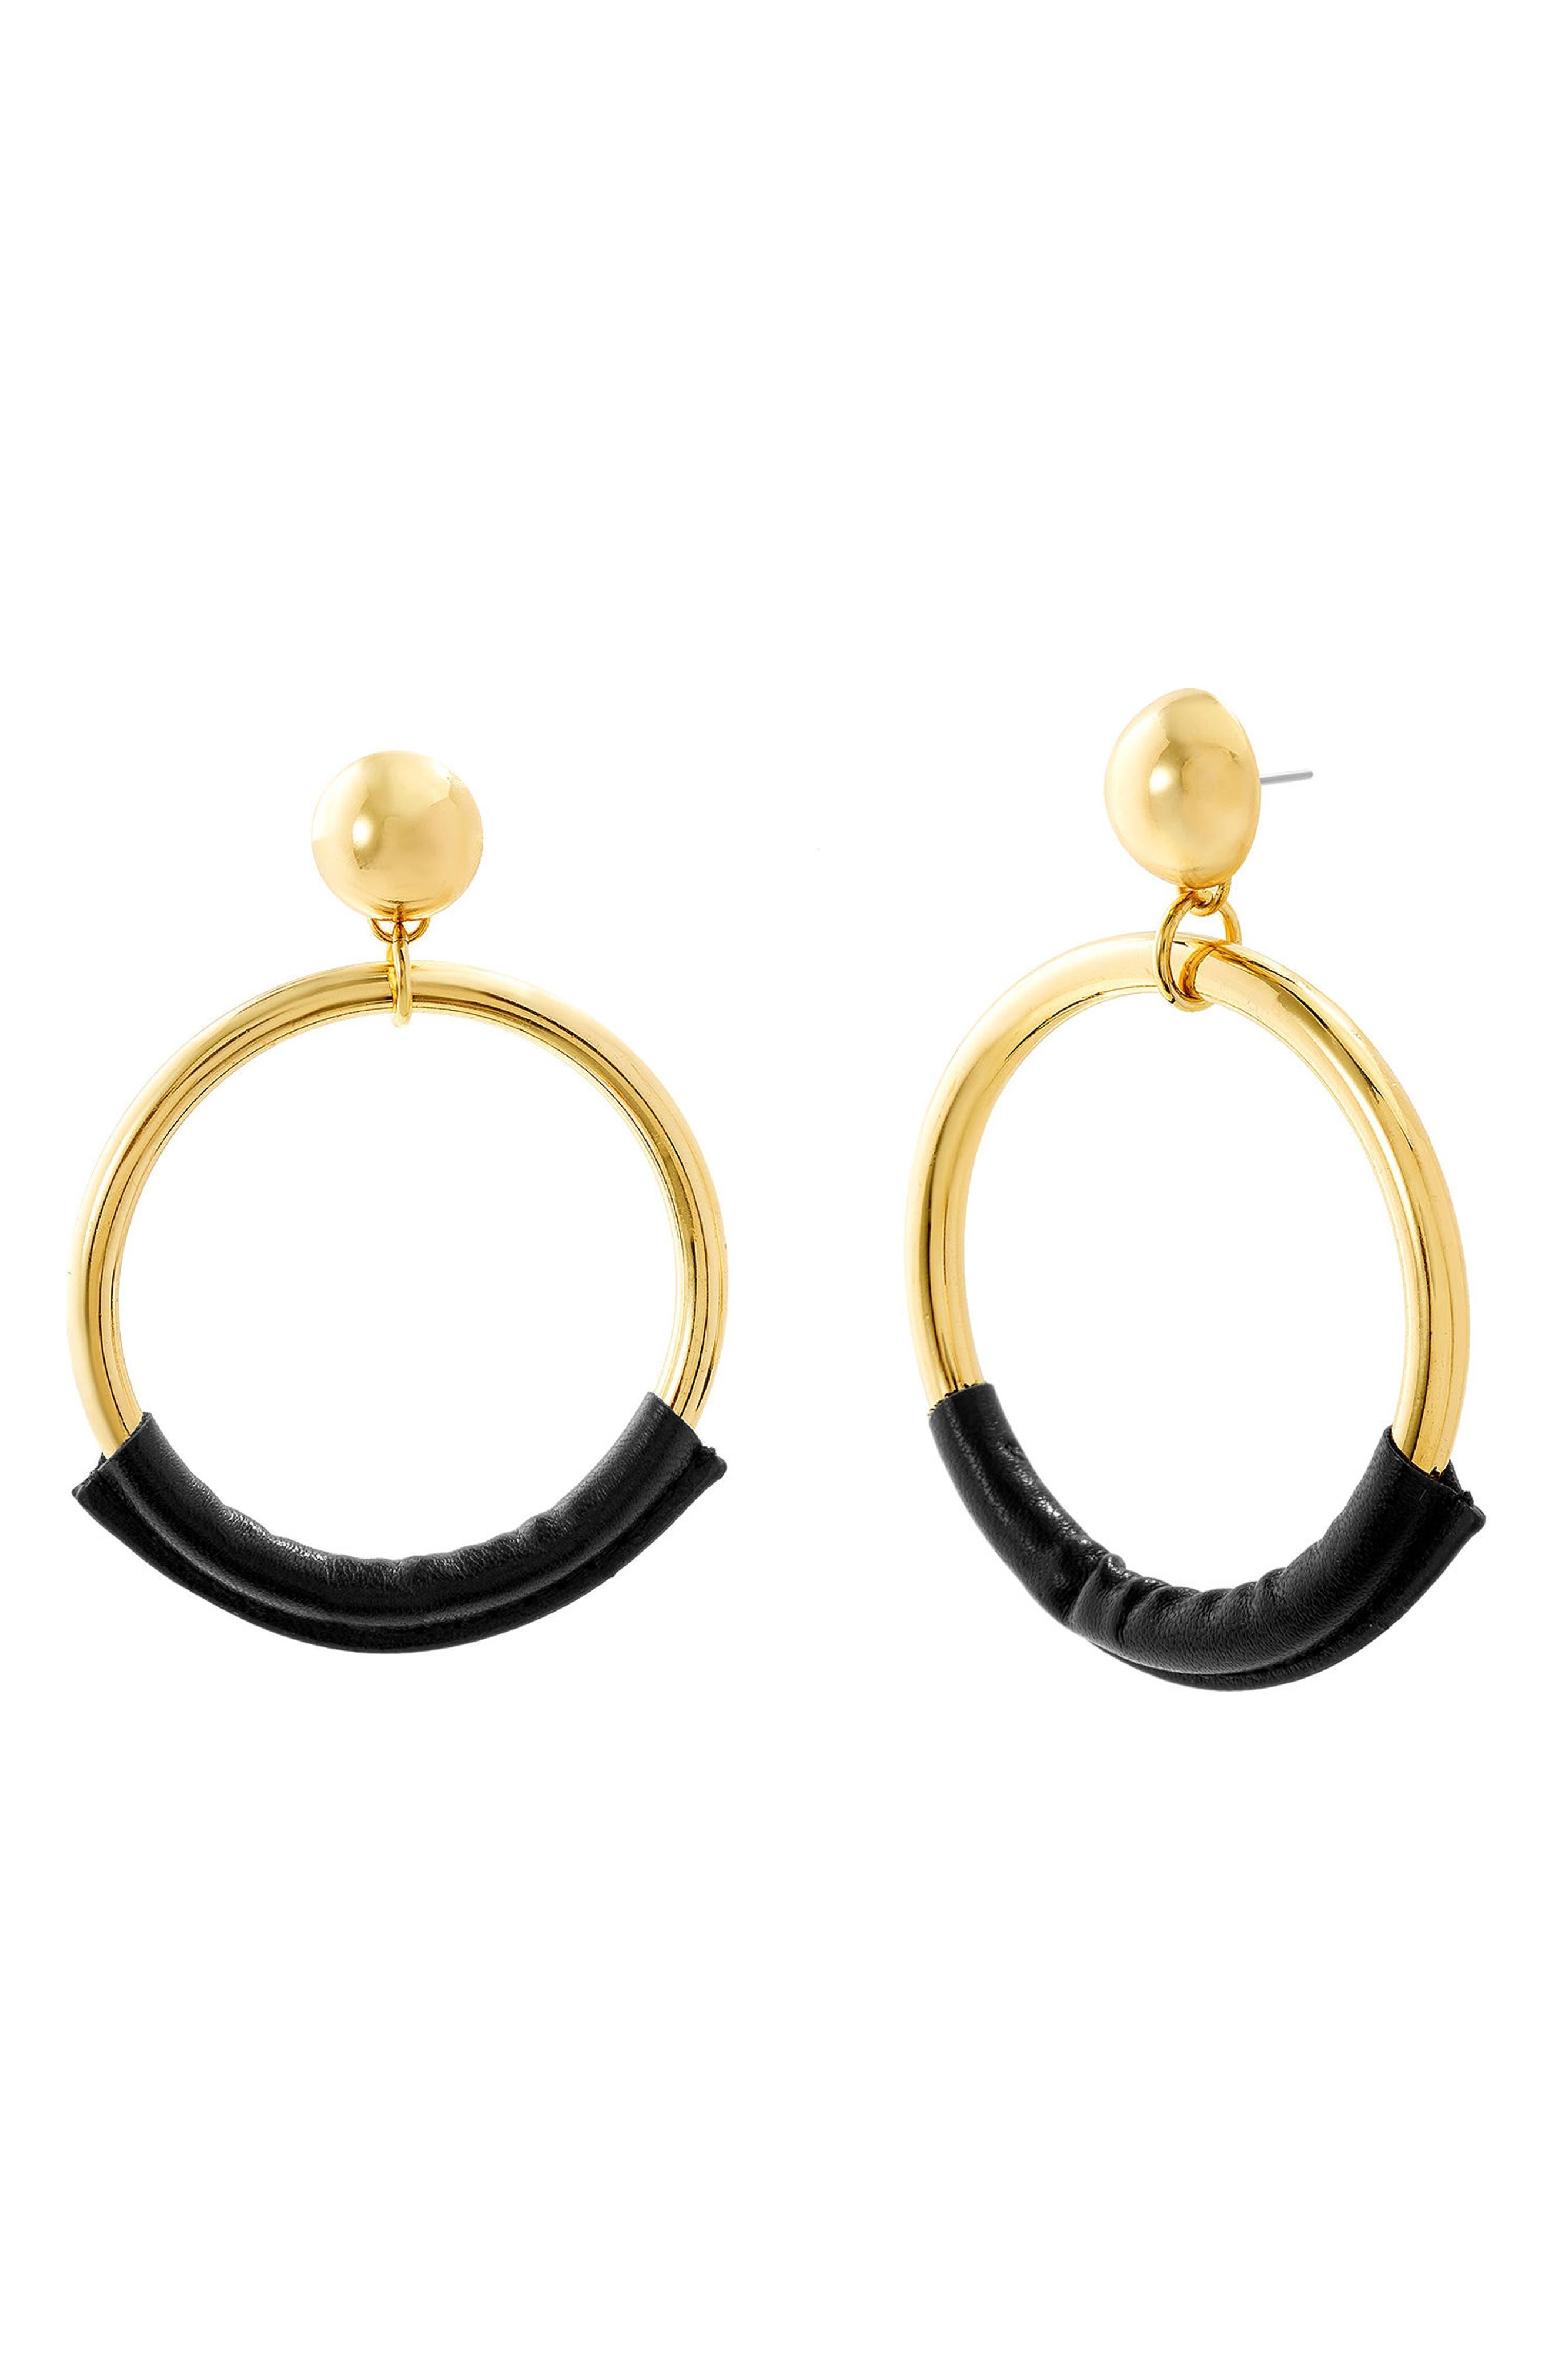 Leather Trim Hoop Earrings,                             Main thumbnail 1, color,                             710